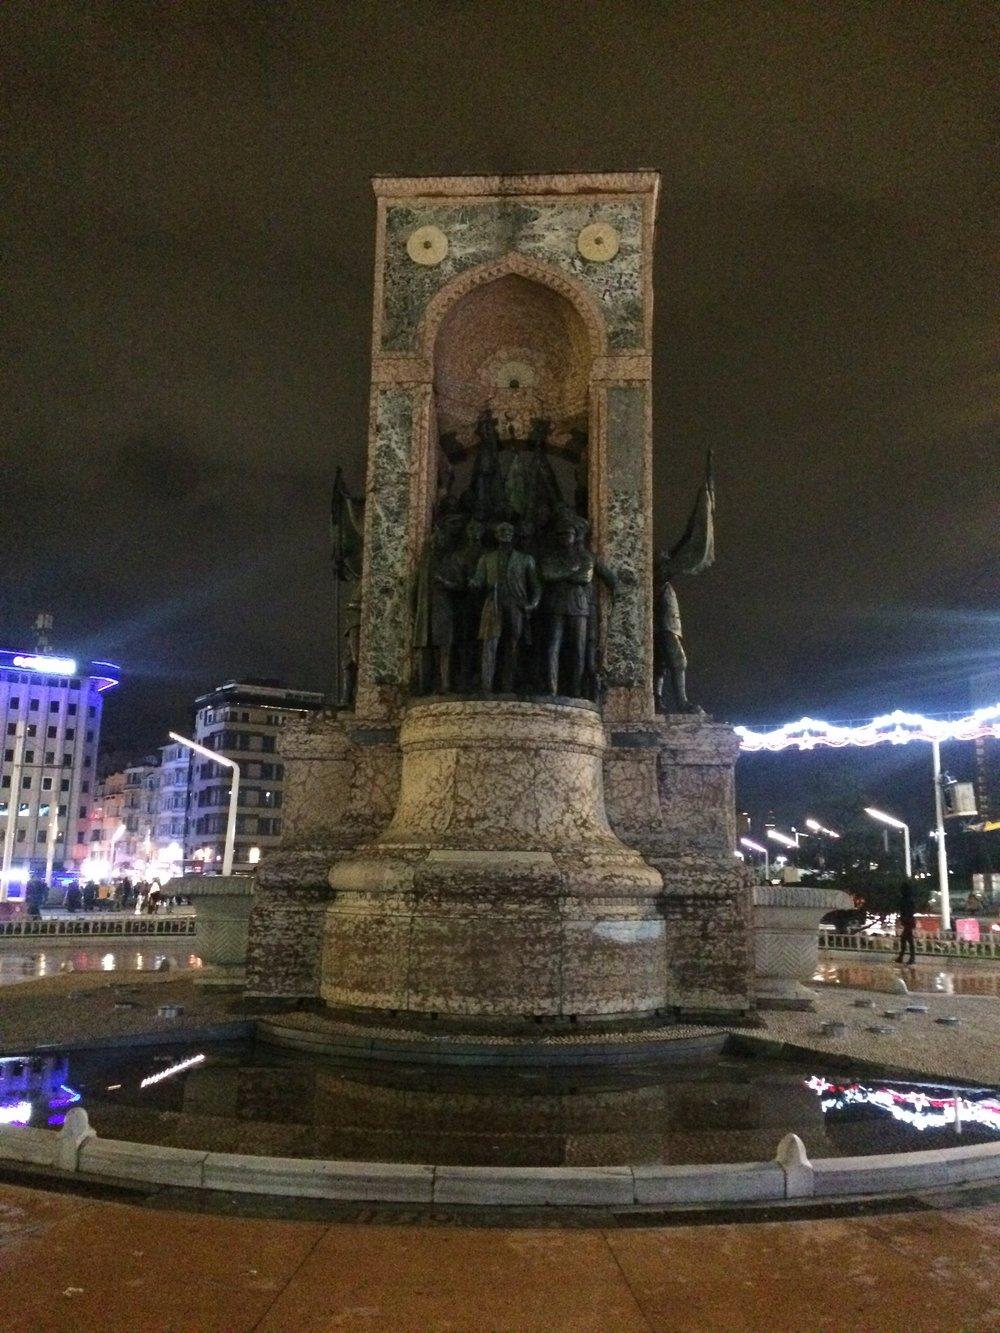 The Republic Monument at Taksim Square.